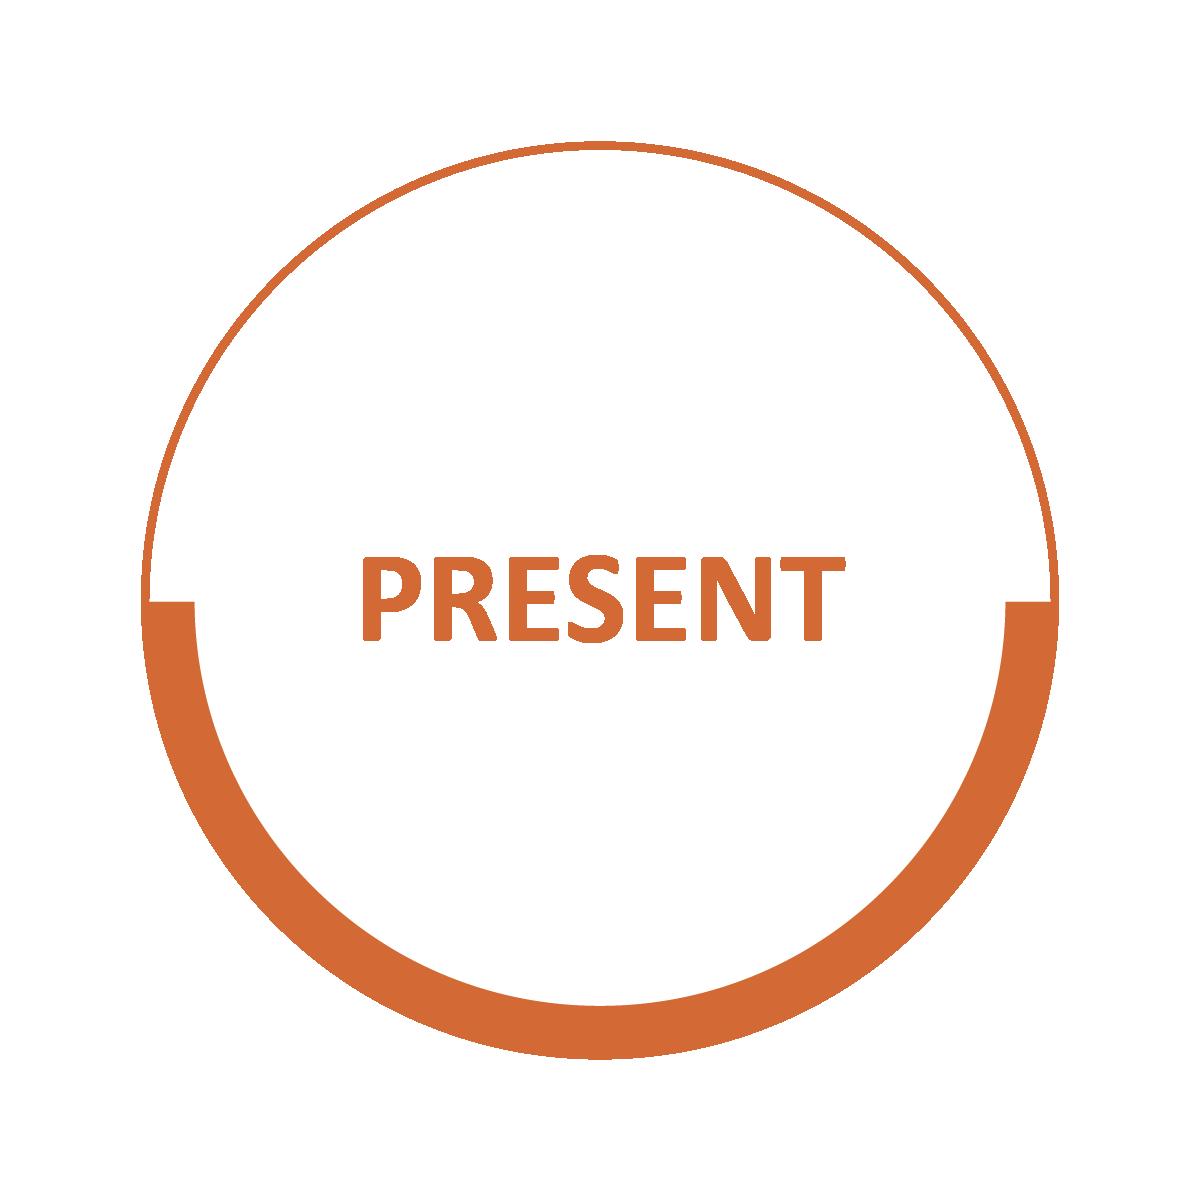 PAS PRESENT FUTURE-02.png